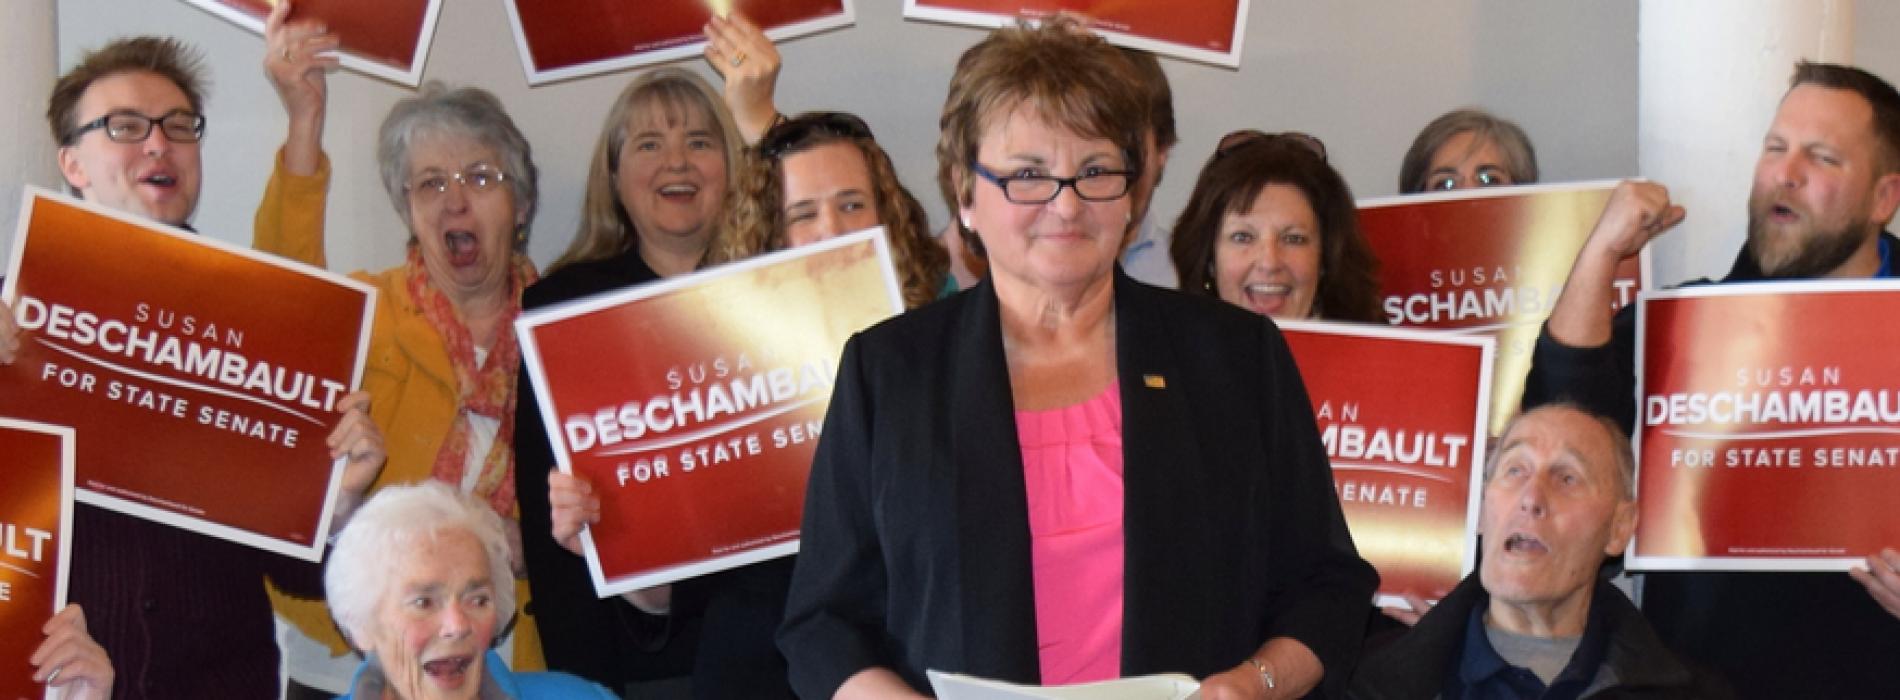 Gov. LePage refuses to swear in duly-elected Democratic Senator